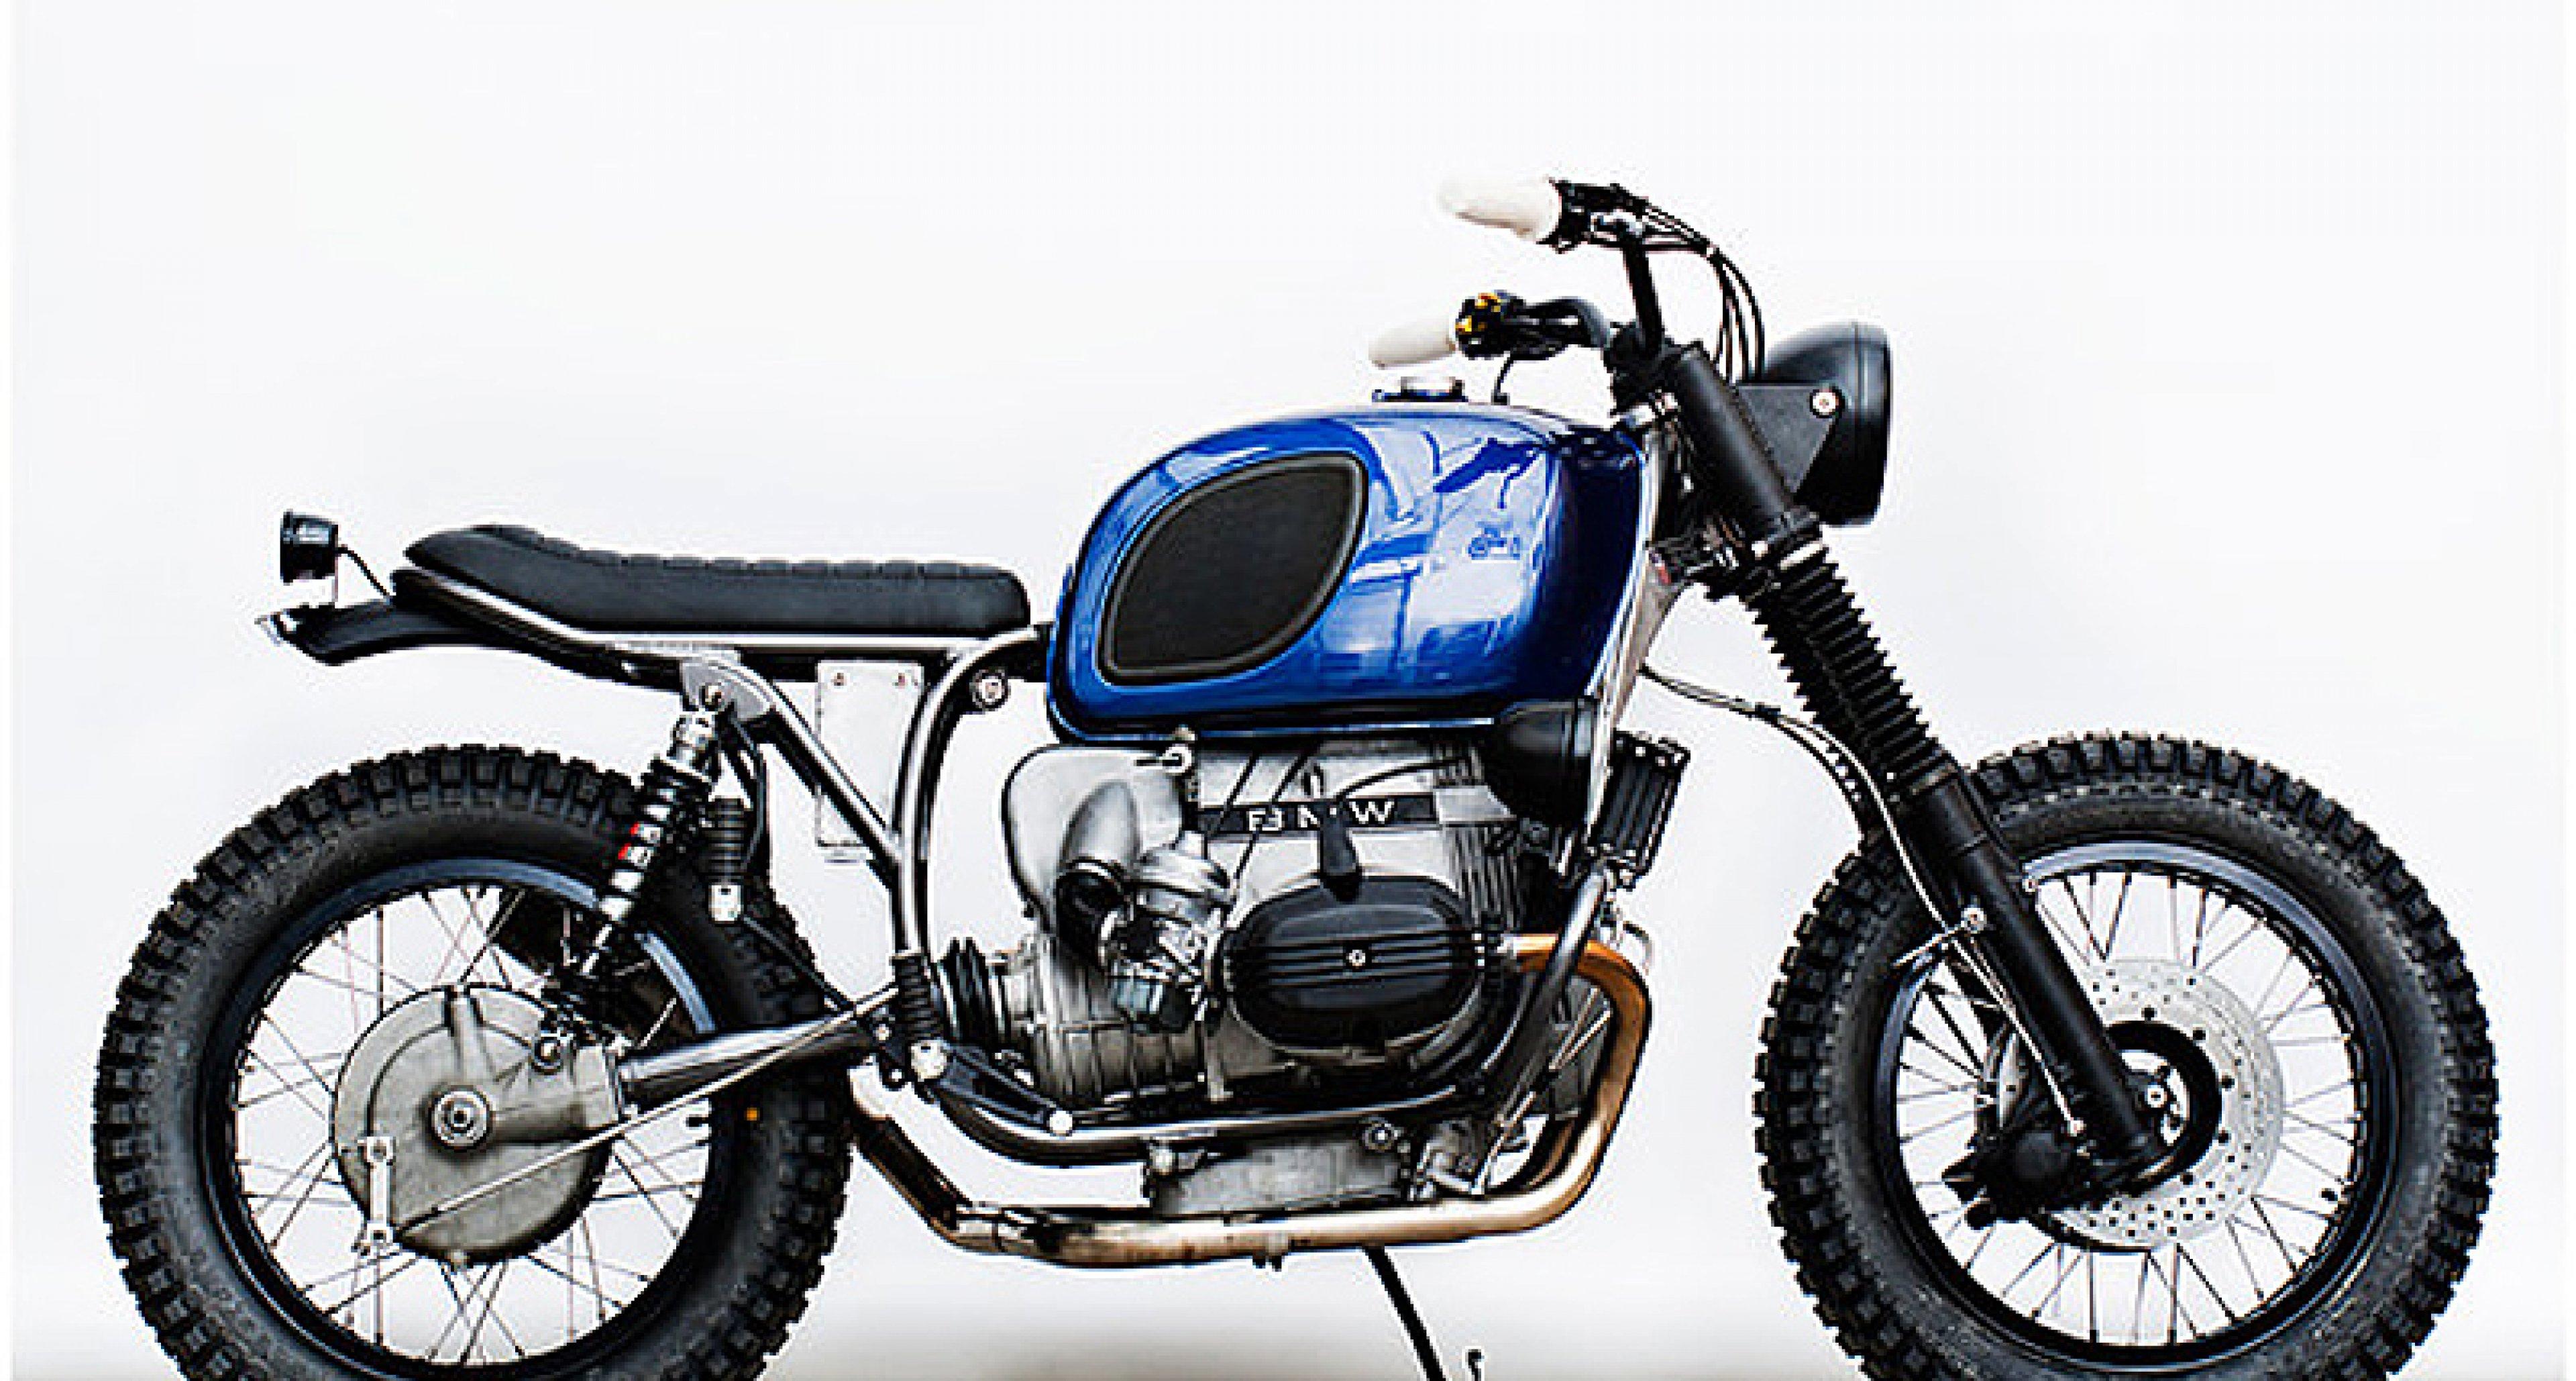 Wrenchmonkees BMW R100 RT: Danish Dynamite